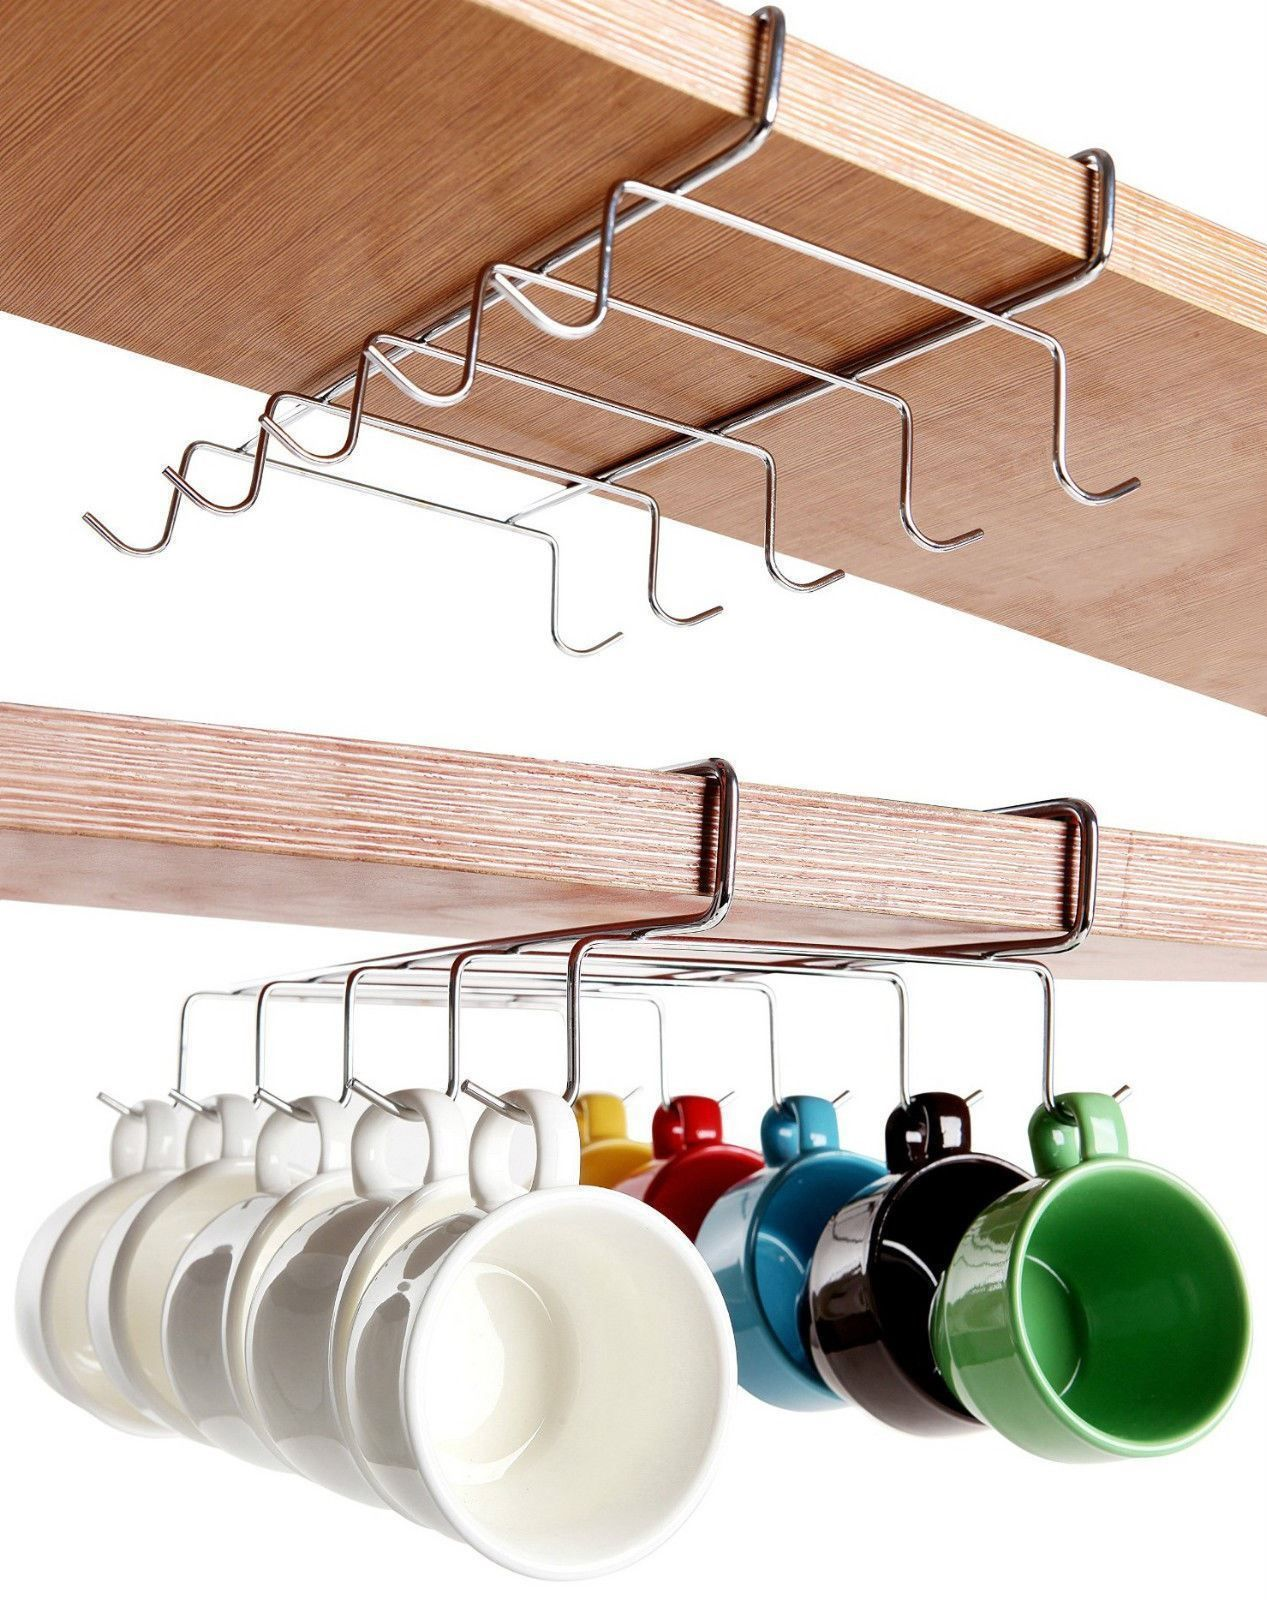 8 08 Gbp Chrome Under Shelf Cabinet Mug Tea Cup Holder Storage Hook Organizer 10 Hook Ebay Home Under Shelf Storage Kitchen Cupboard Storage Mug Storage